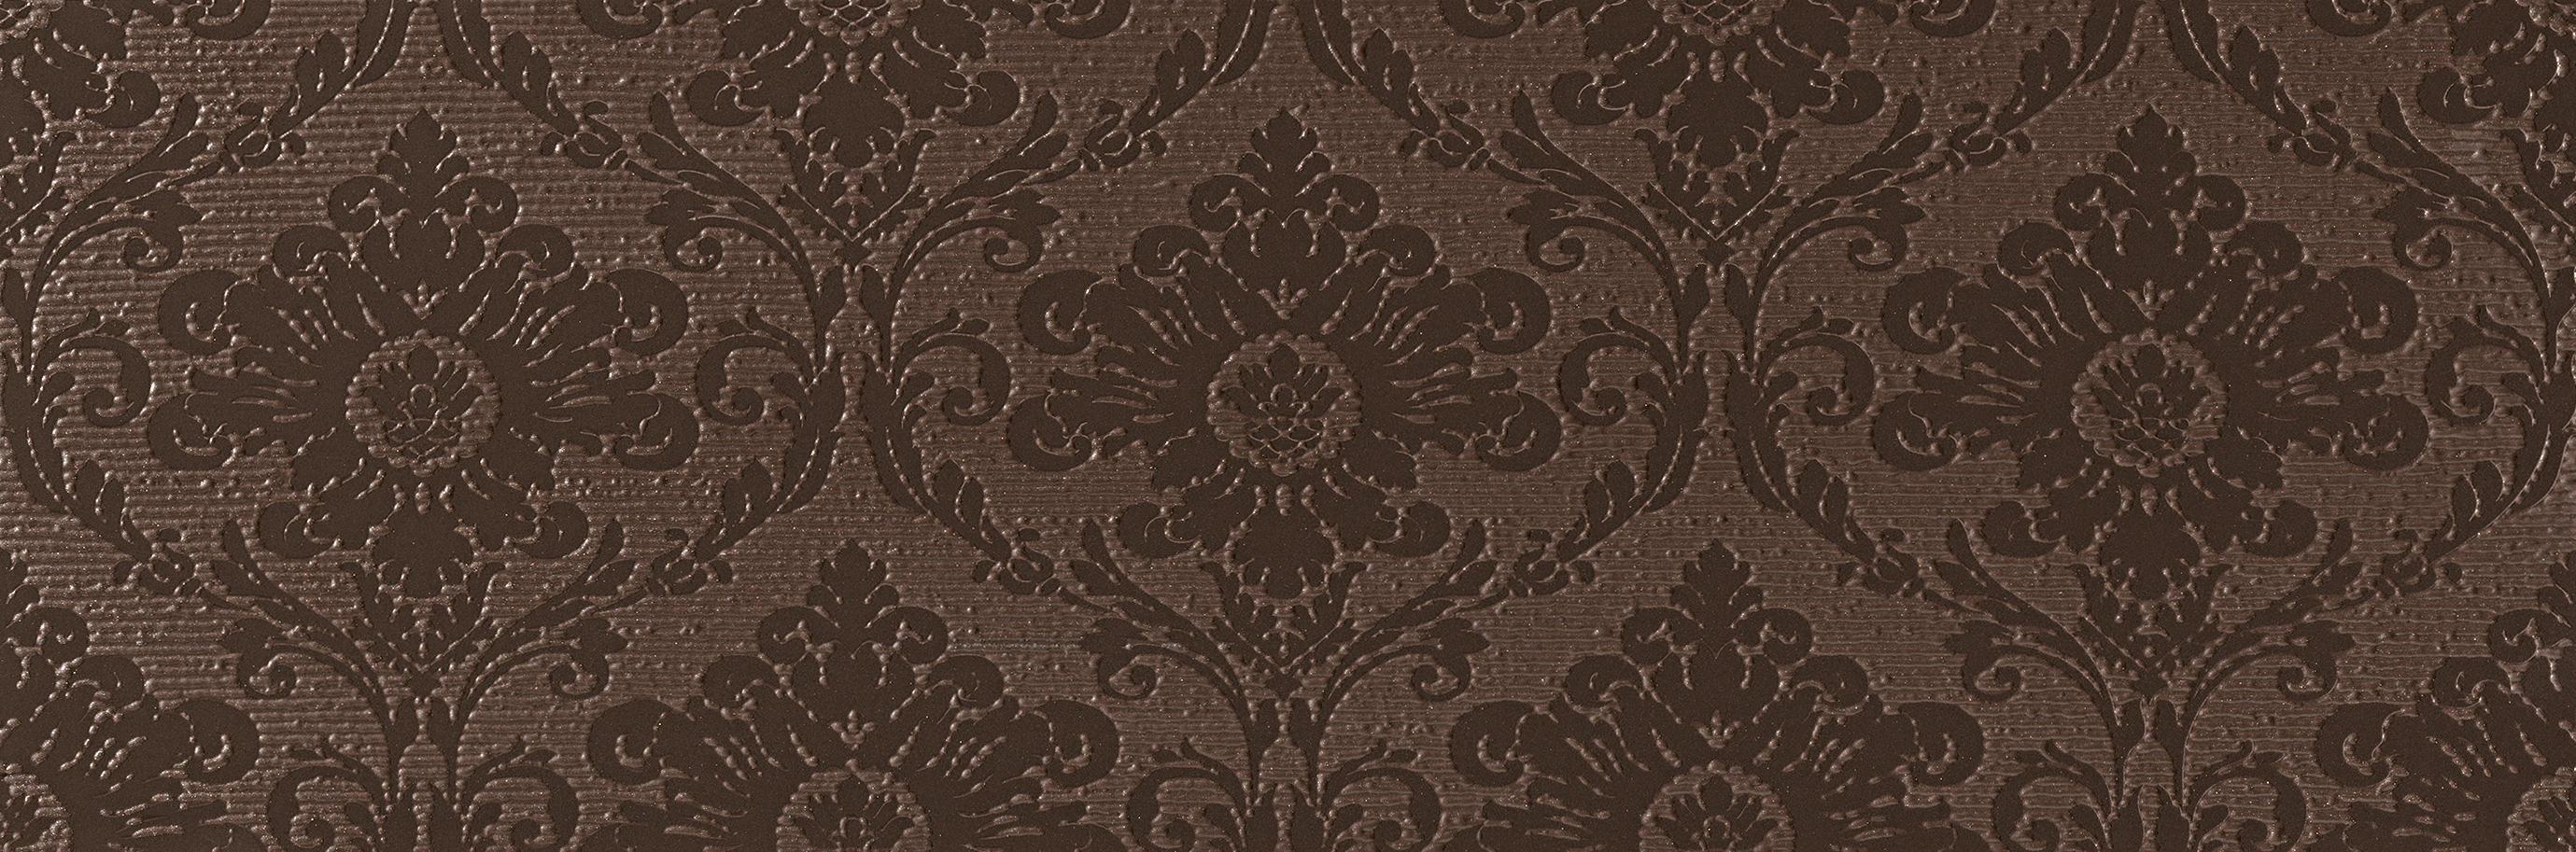 lumina glam caramel damasco ceramic tiles from fap. Black Bedroom Furniture Sets. Home Design Ideas